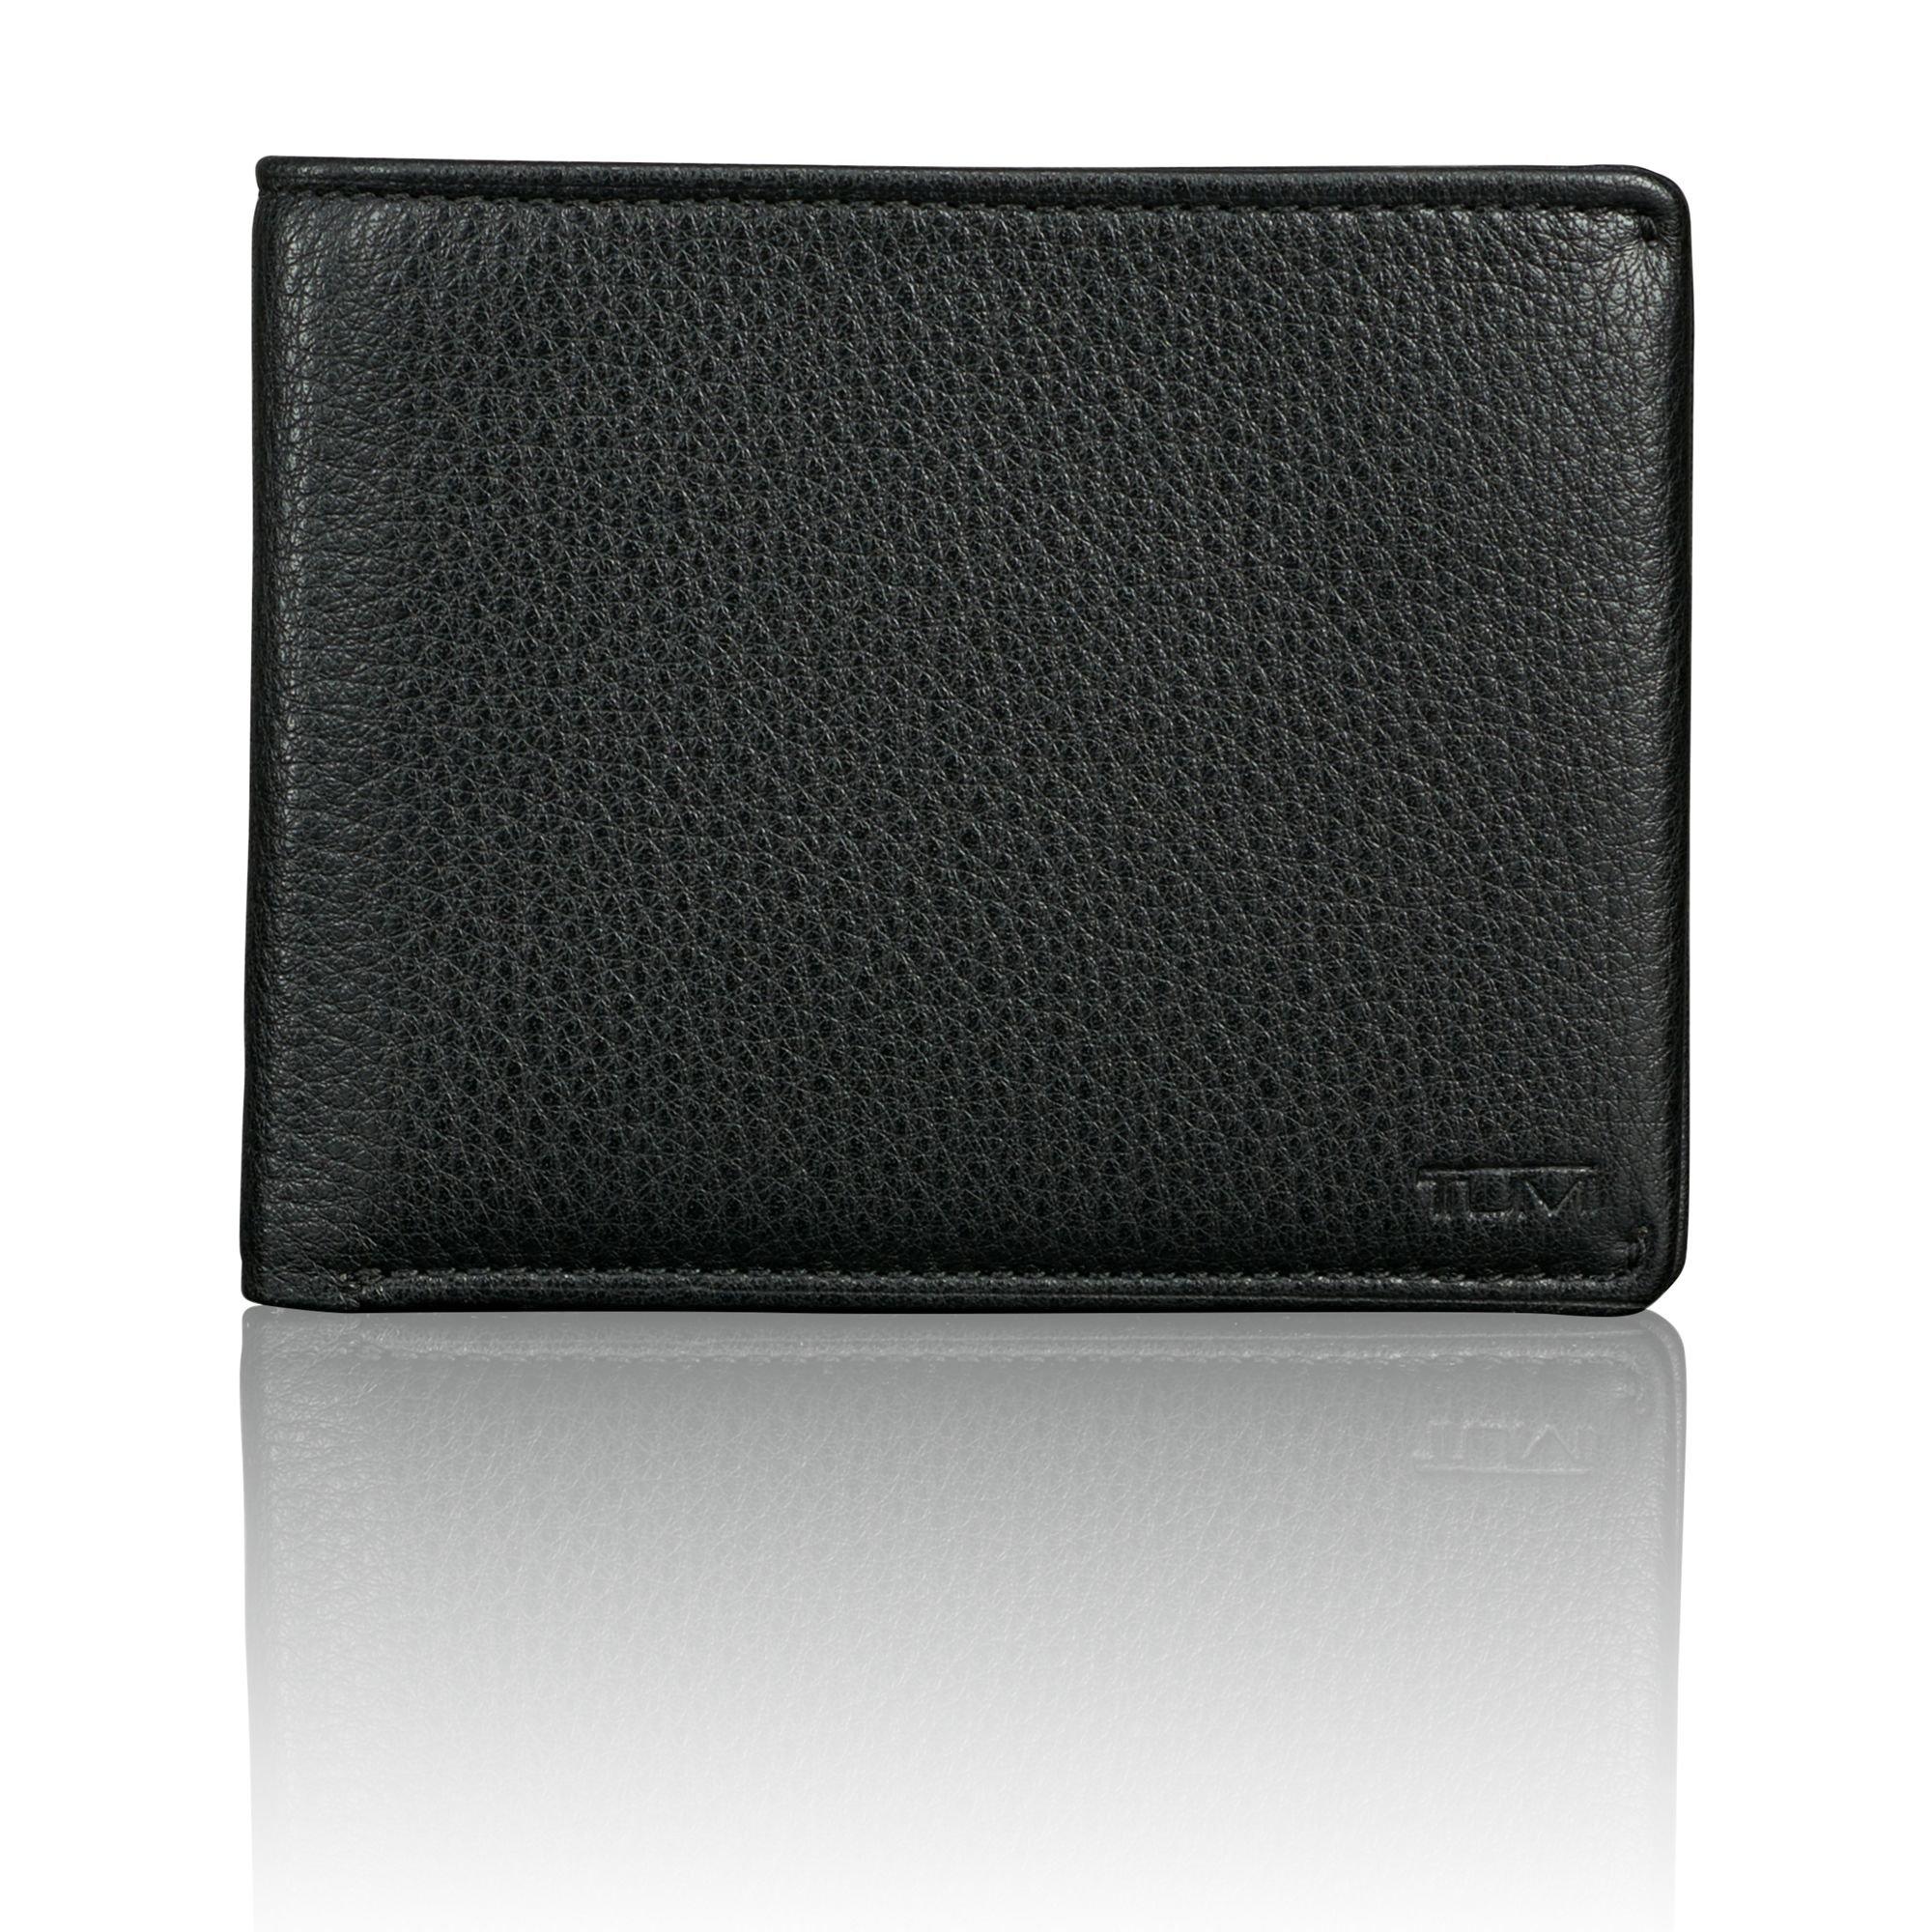 TUMI Men's Nassau Global Double Billfold Wallet